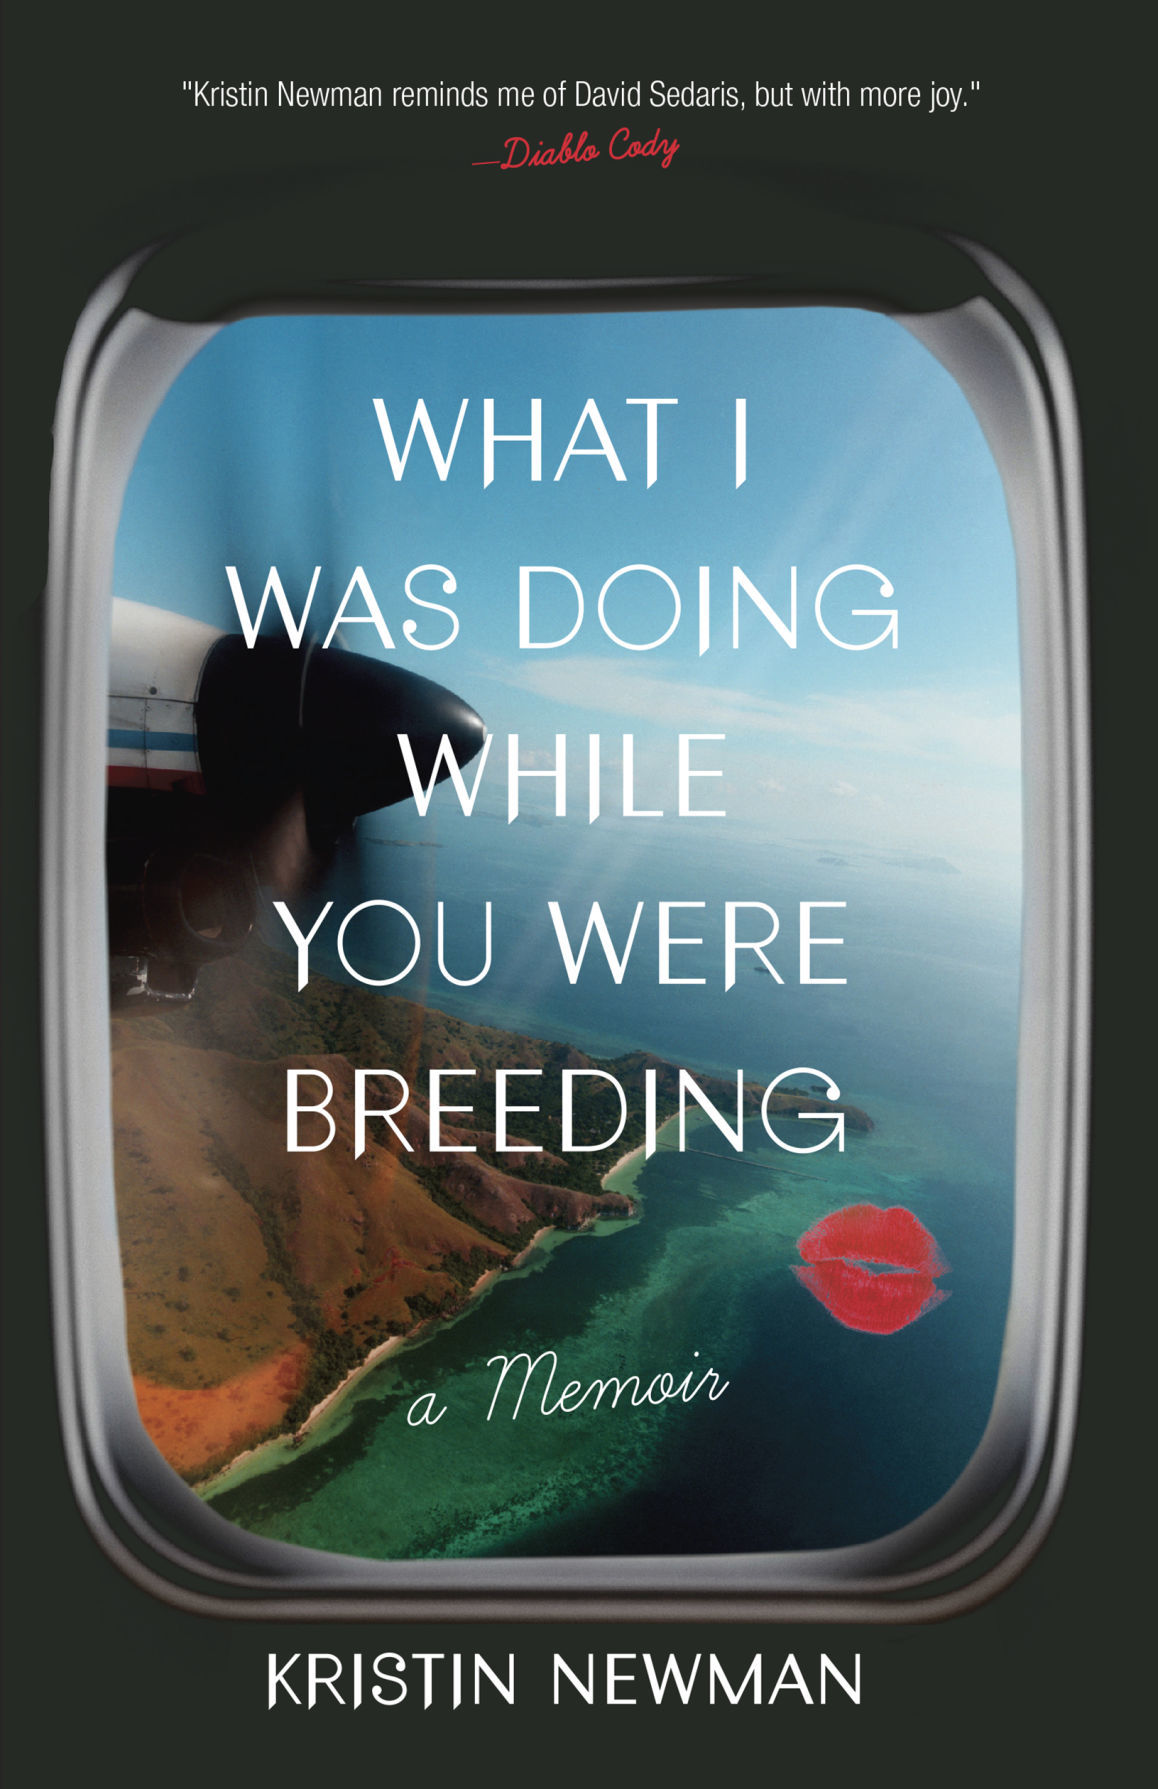 """What I was Doing While You Were Breeding: A Memoir"""